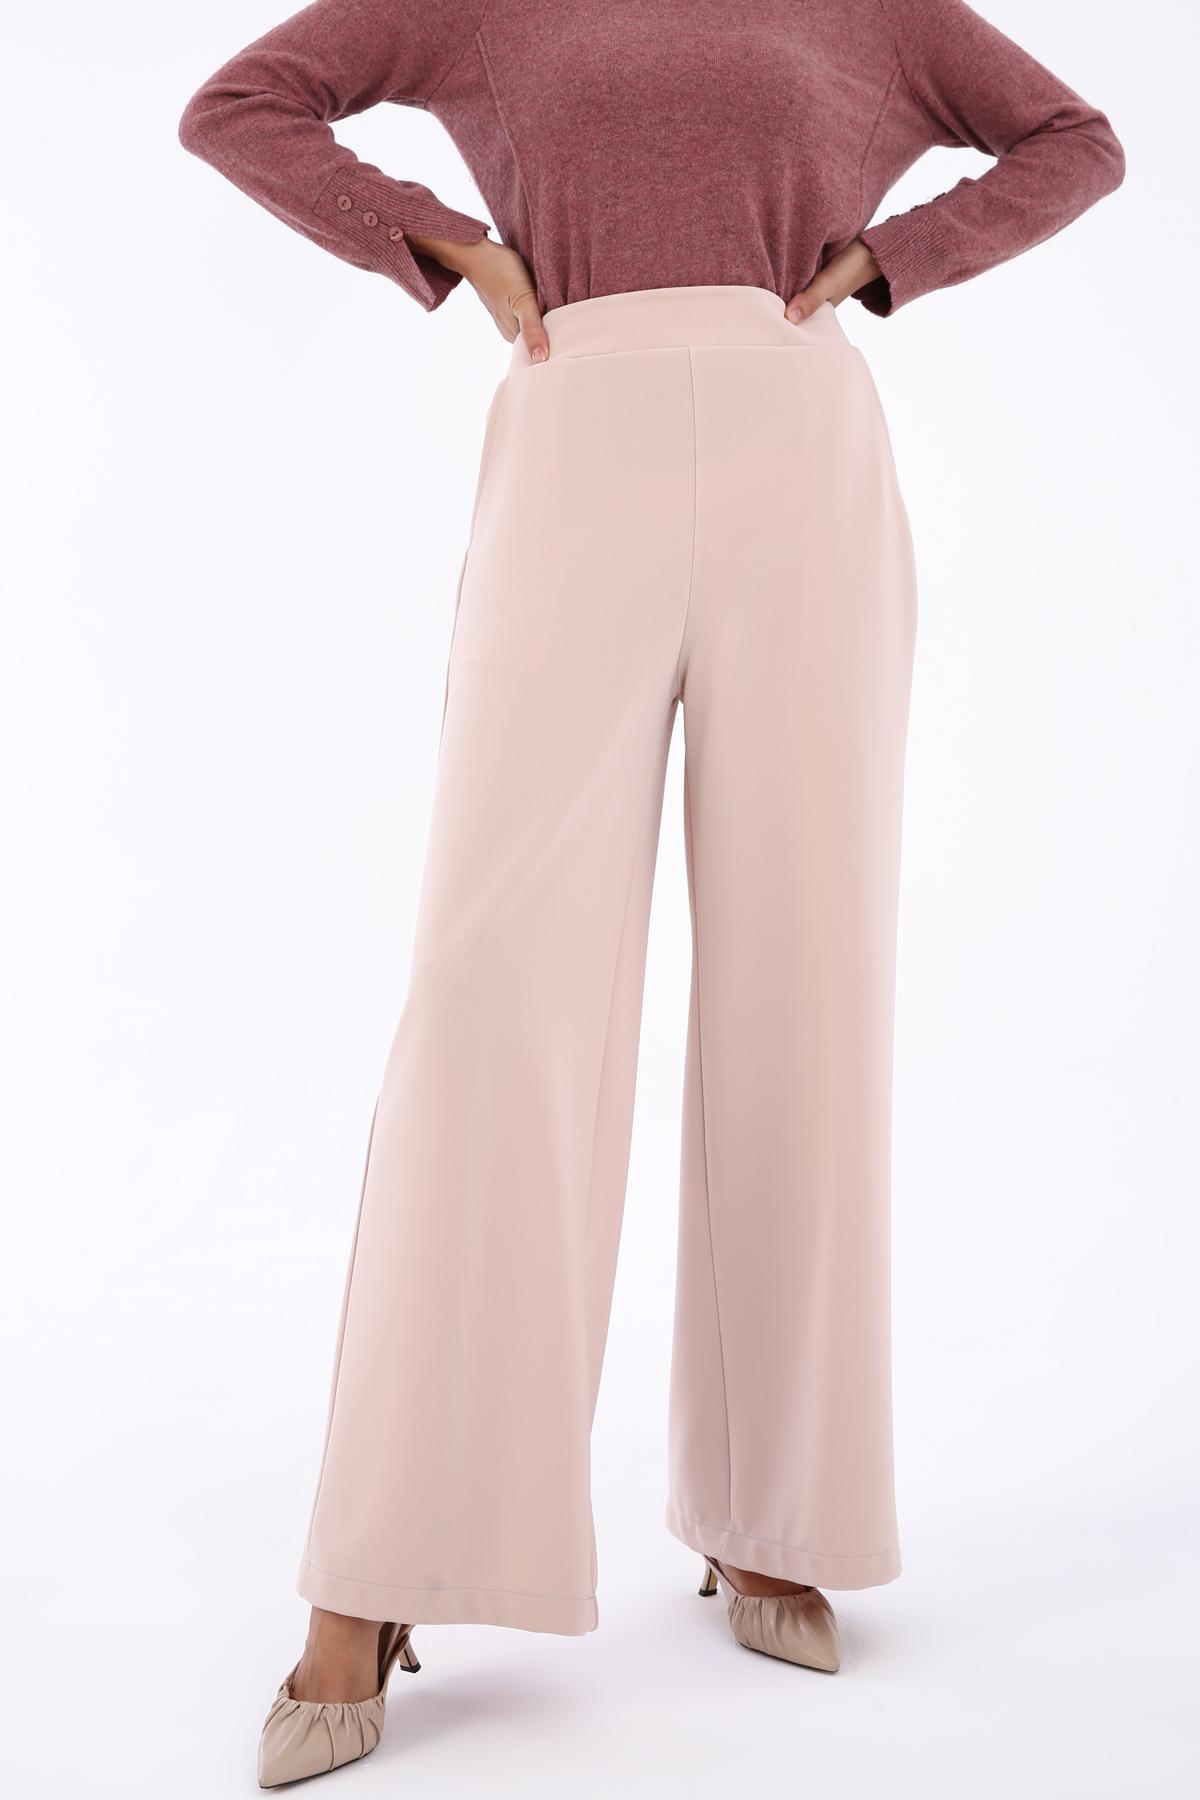 Jacquard Fabric Elastic Waist Pants